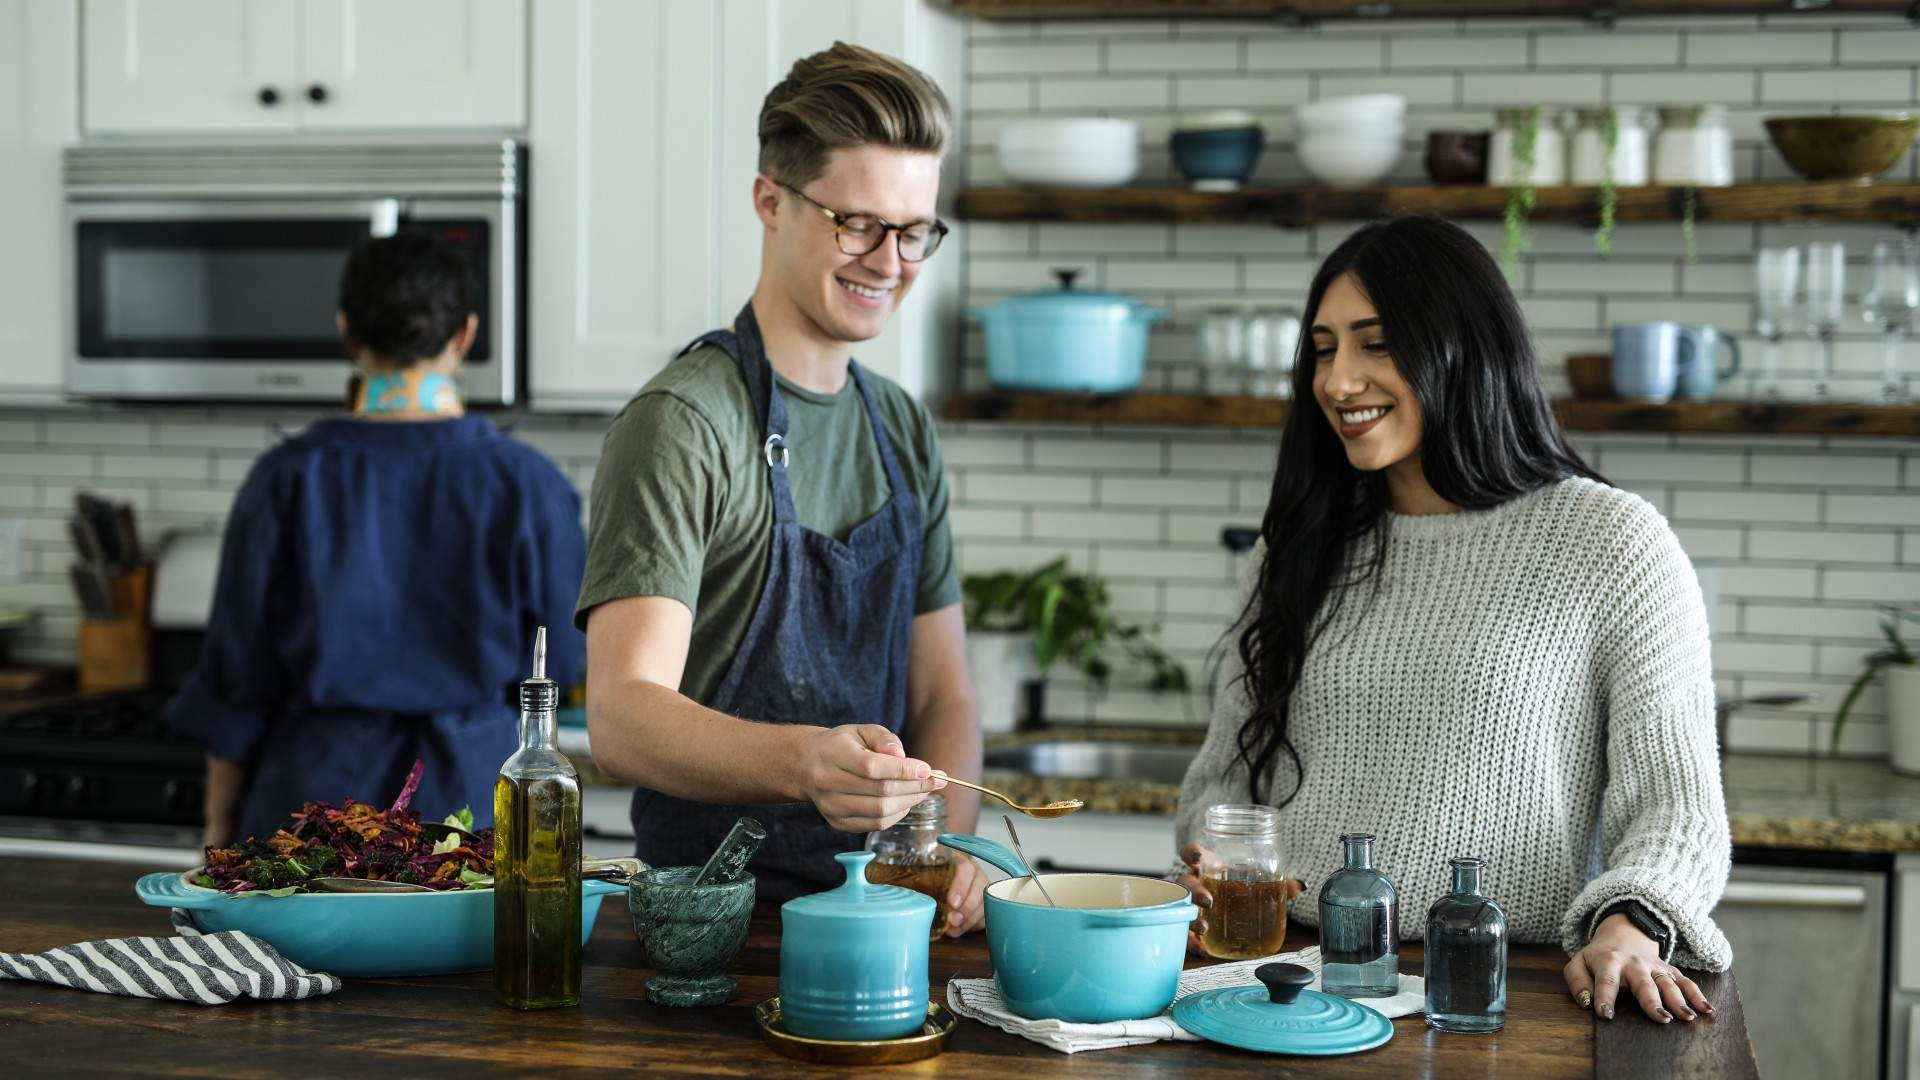 Six Quarantine Cooking Projects That Aren't Baking Sourdough